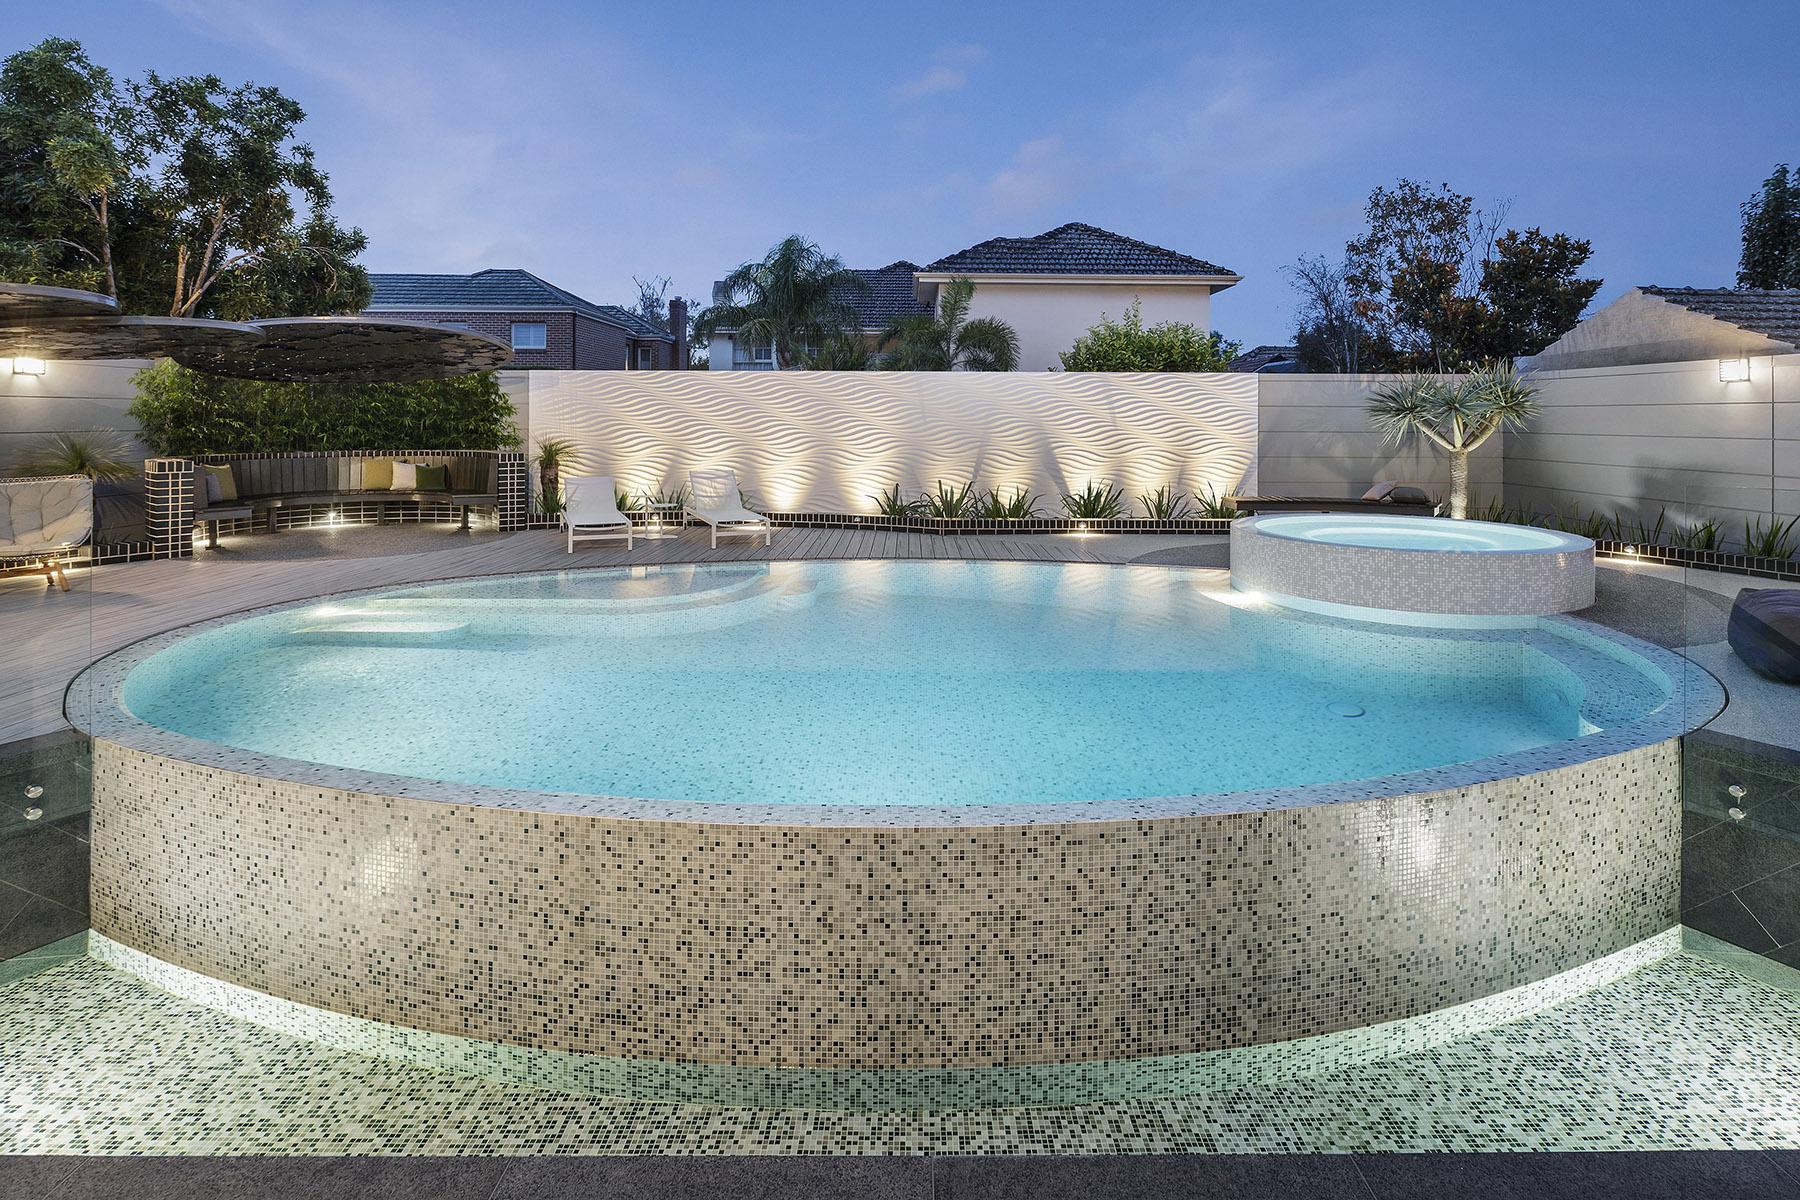 Bisazza mosaic pool and spa by Laguna Pools